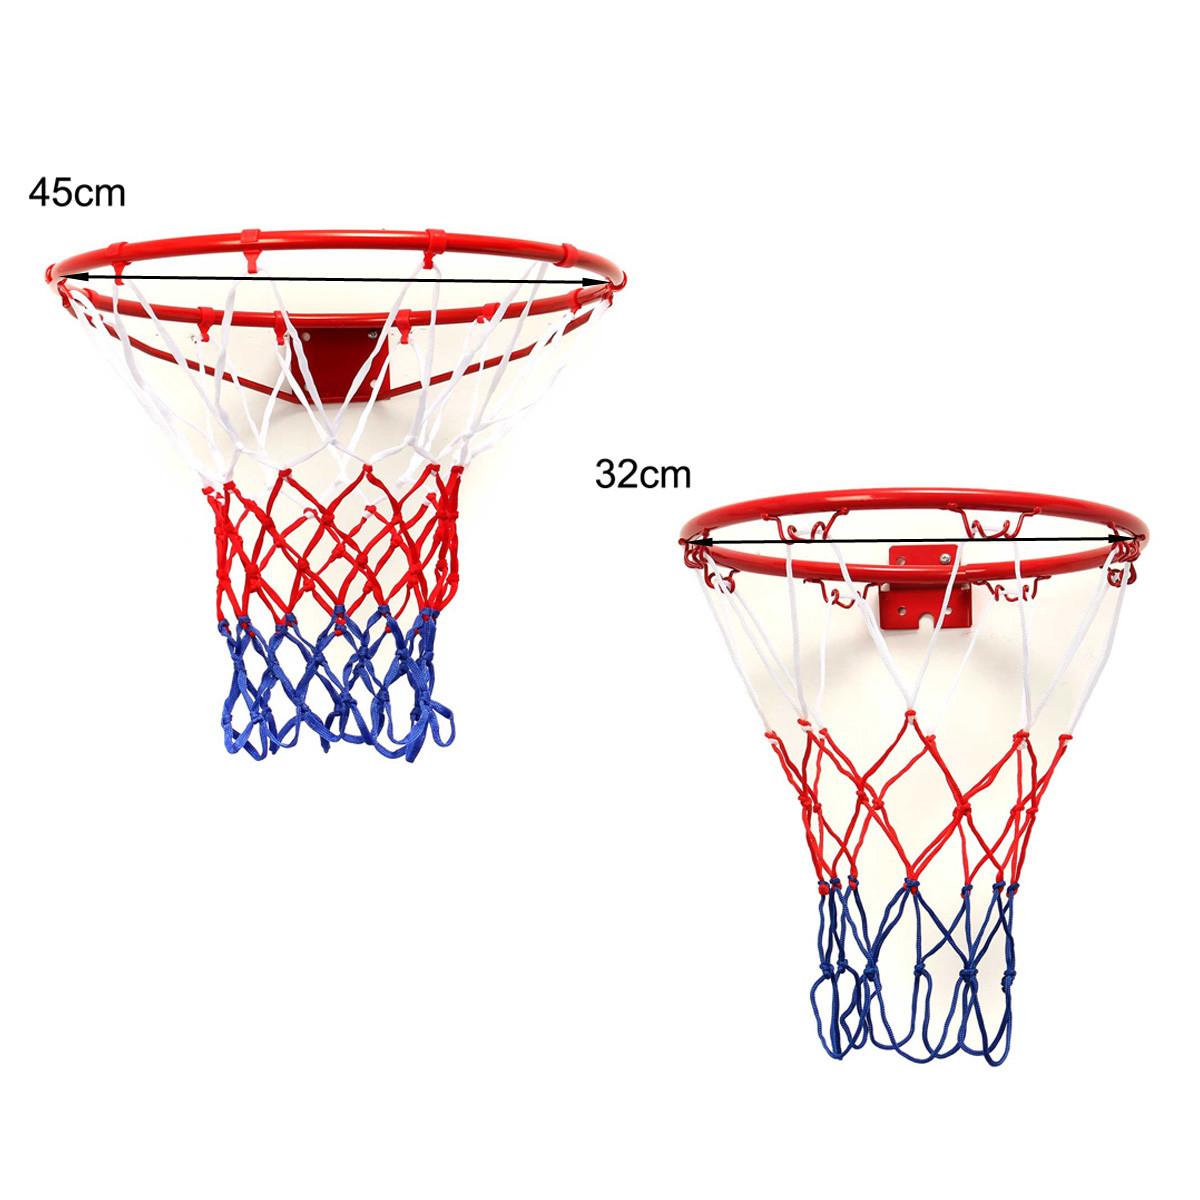 Wall Mounted Hanging Basketball Goal Hoop Rim Metal Netting